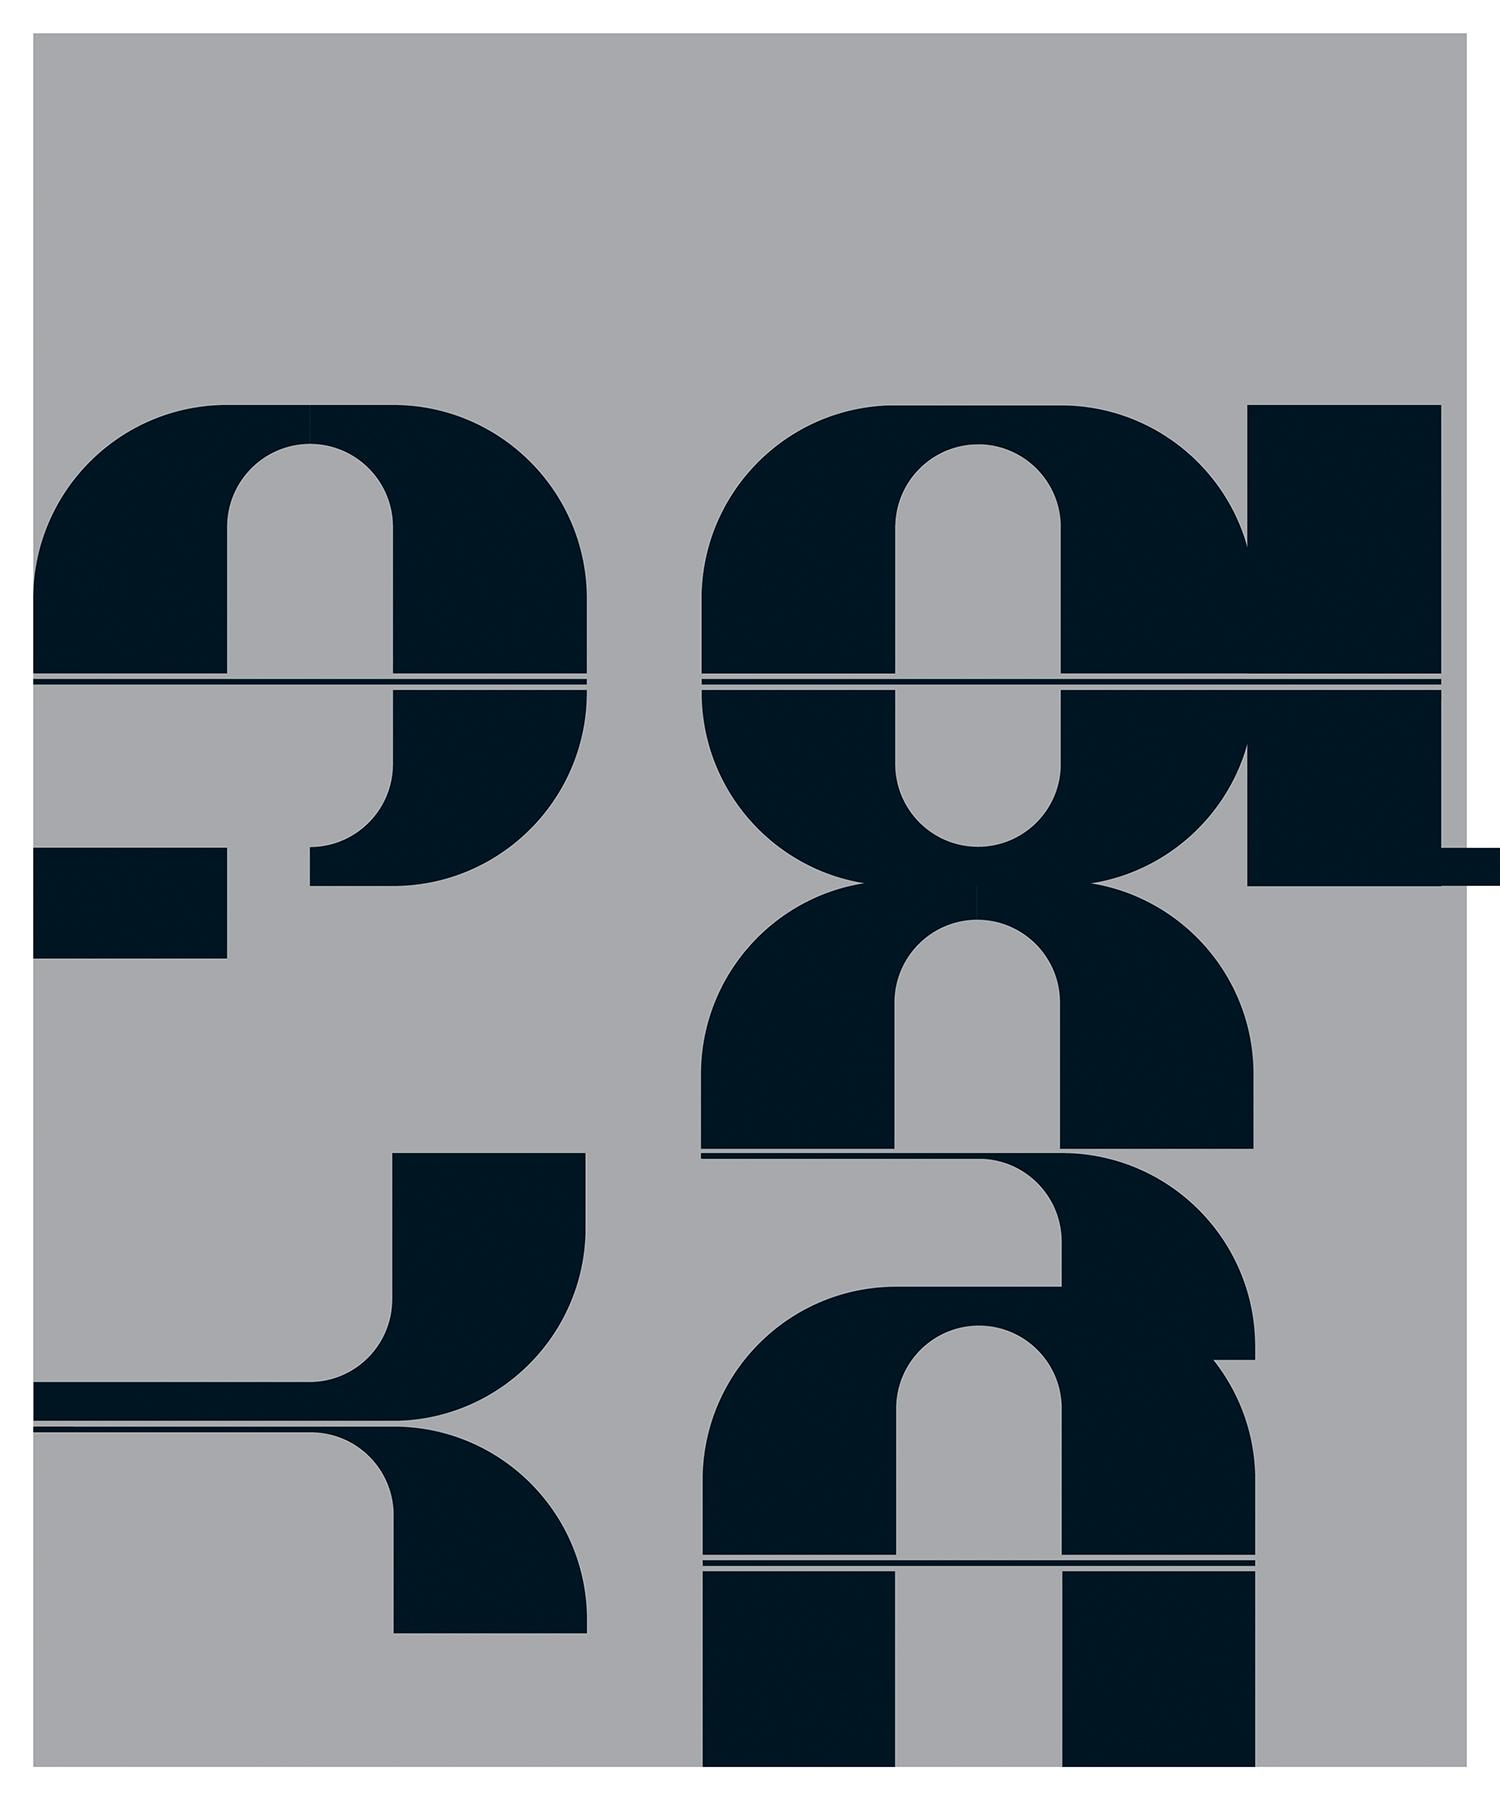 +81 – uk + polish graphic design